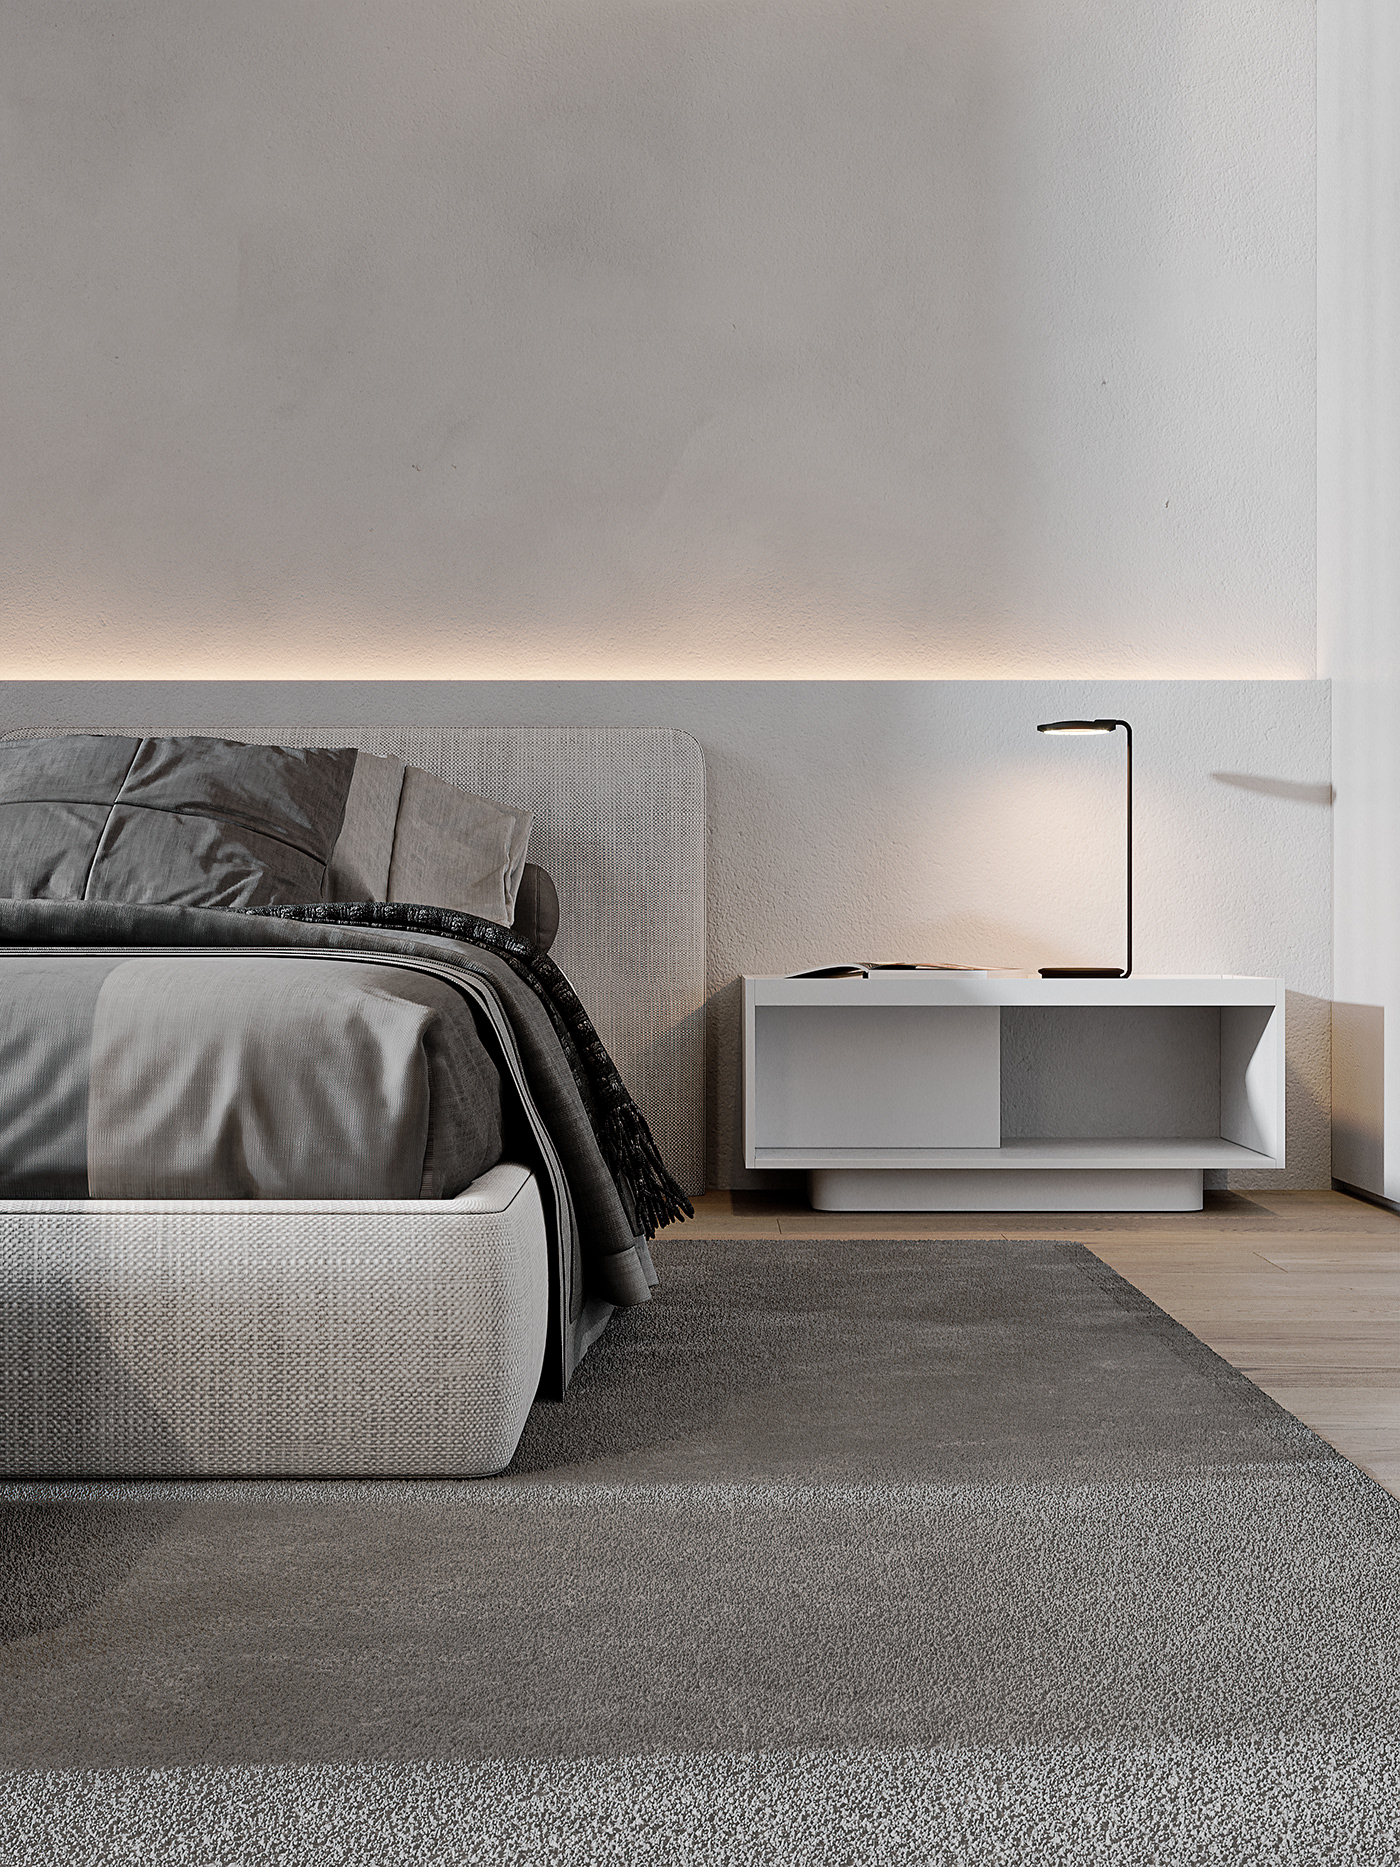 #architecture #bedrooom #behance #CG #contemporary #Corona #darkspace #interior #modern   #render